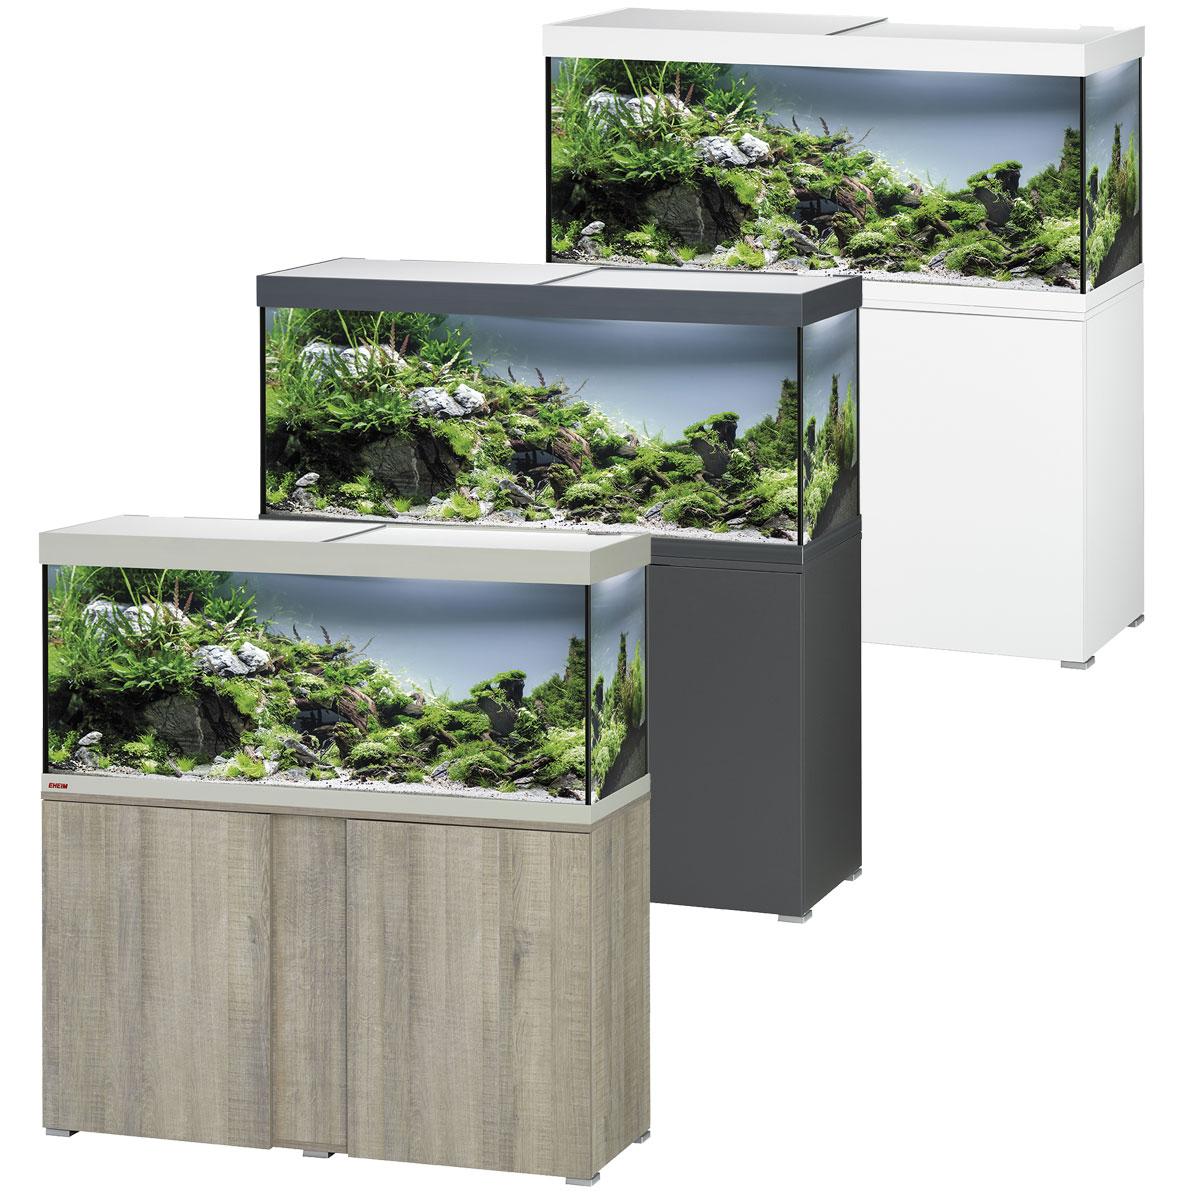 eheim vivaline komplettaquarium mit led 240 liter bei zooroyal. Black Bedroom Furniture Sets. Home Design Ideas